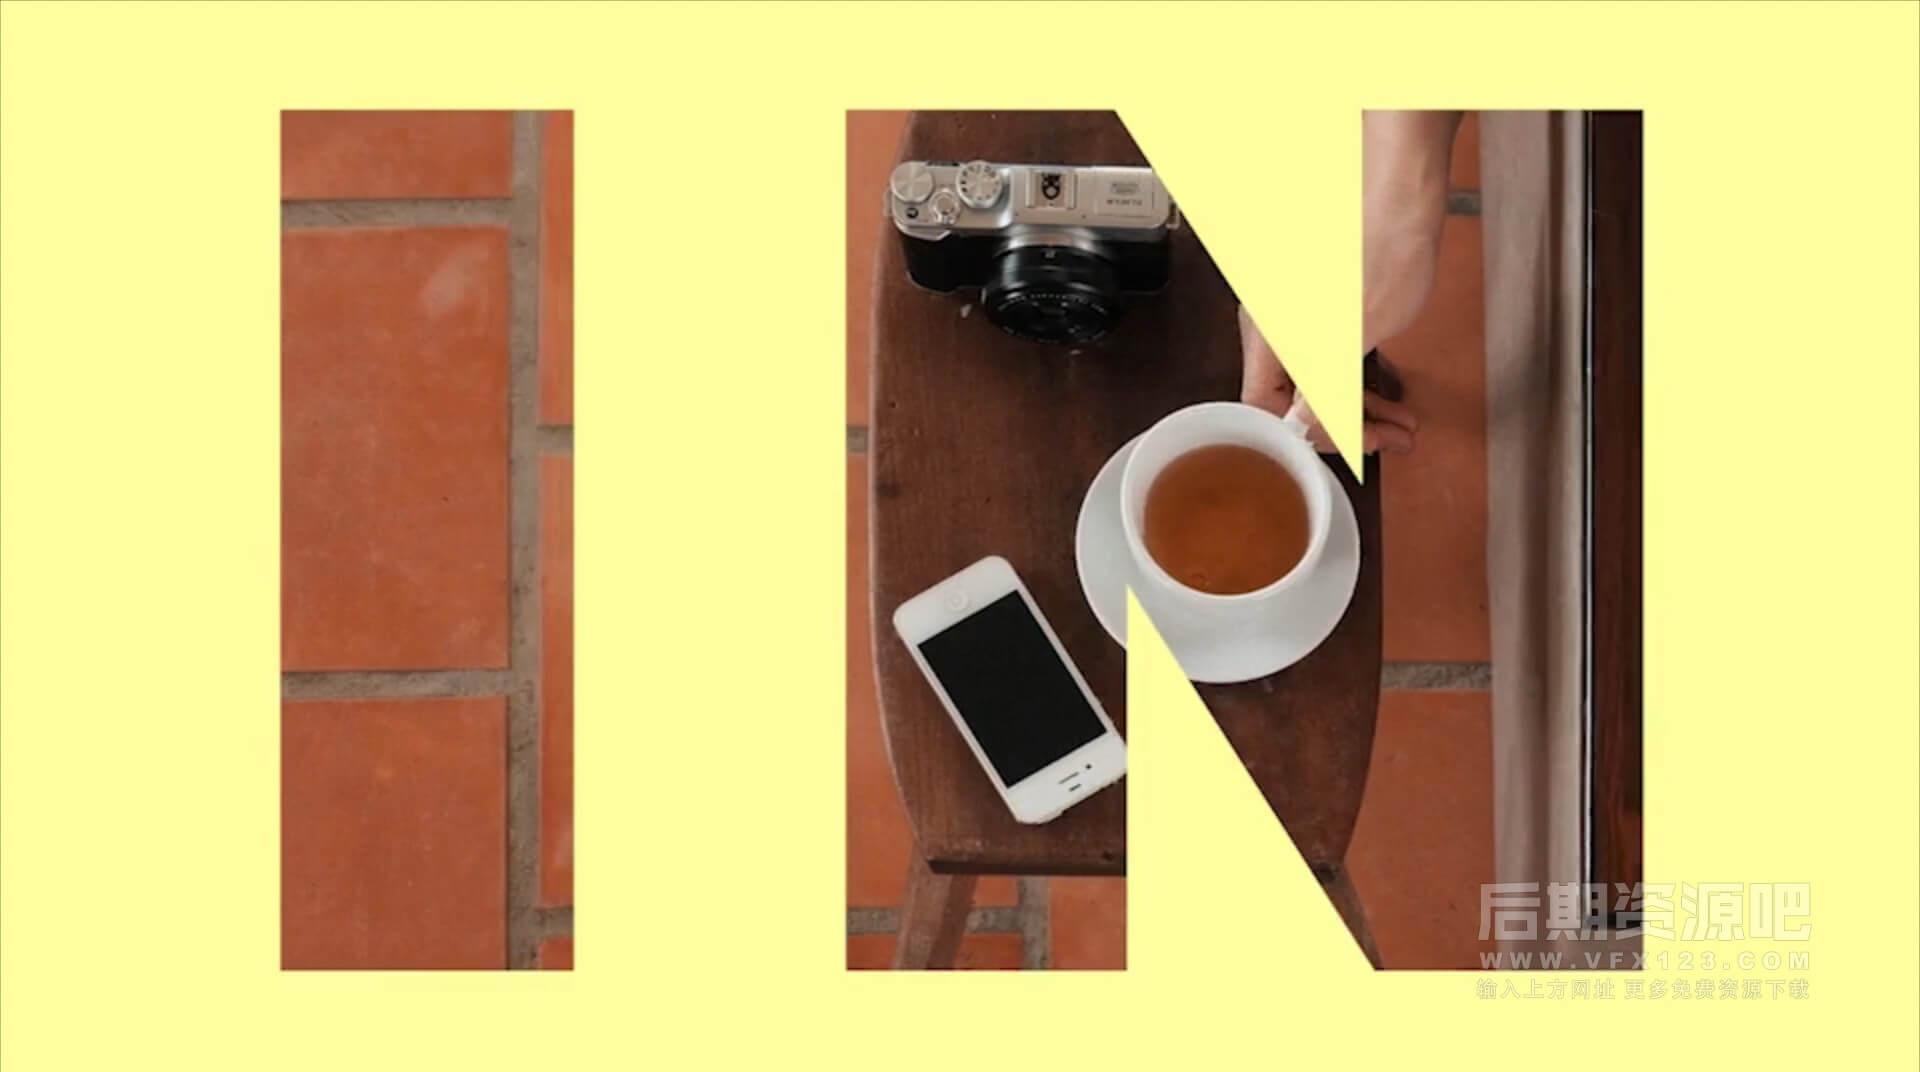 Fcpx主题模板 多彩活力流行镂空文字大标题旅拍模板 Happy Slideshow